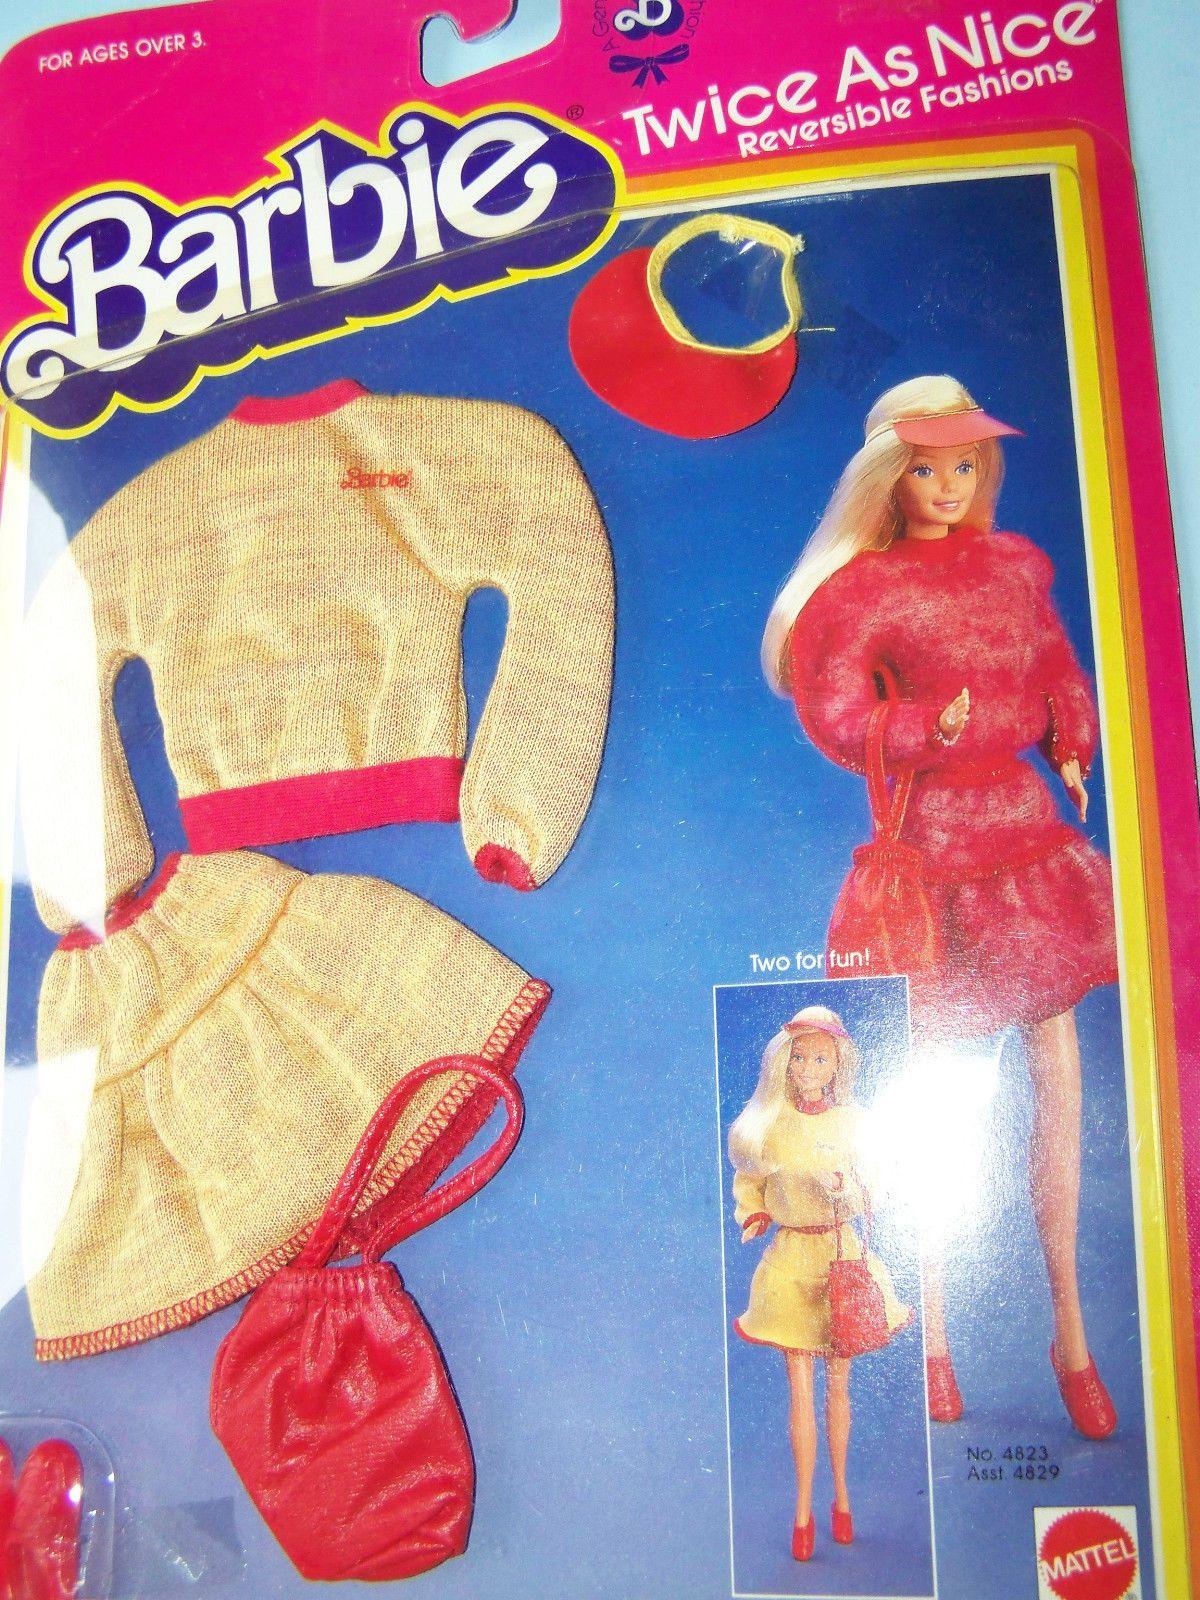 4823 Barbie Twice as Nice Reversible Fashion C 1983 | eBay